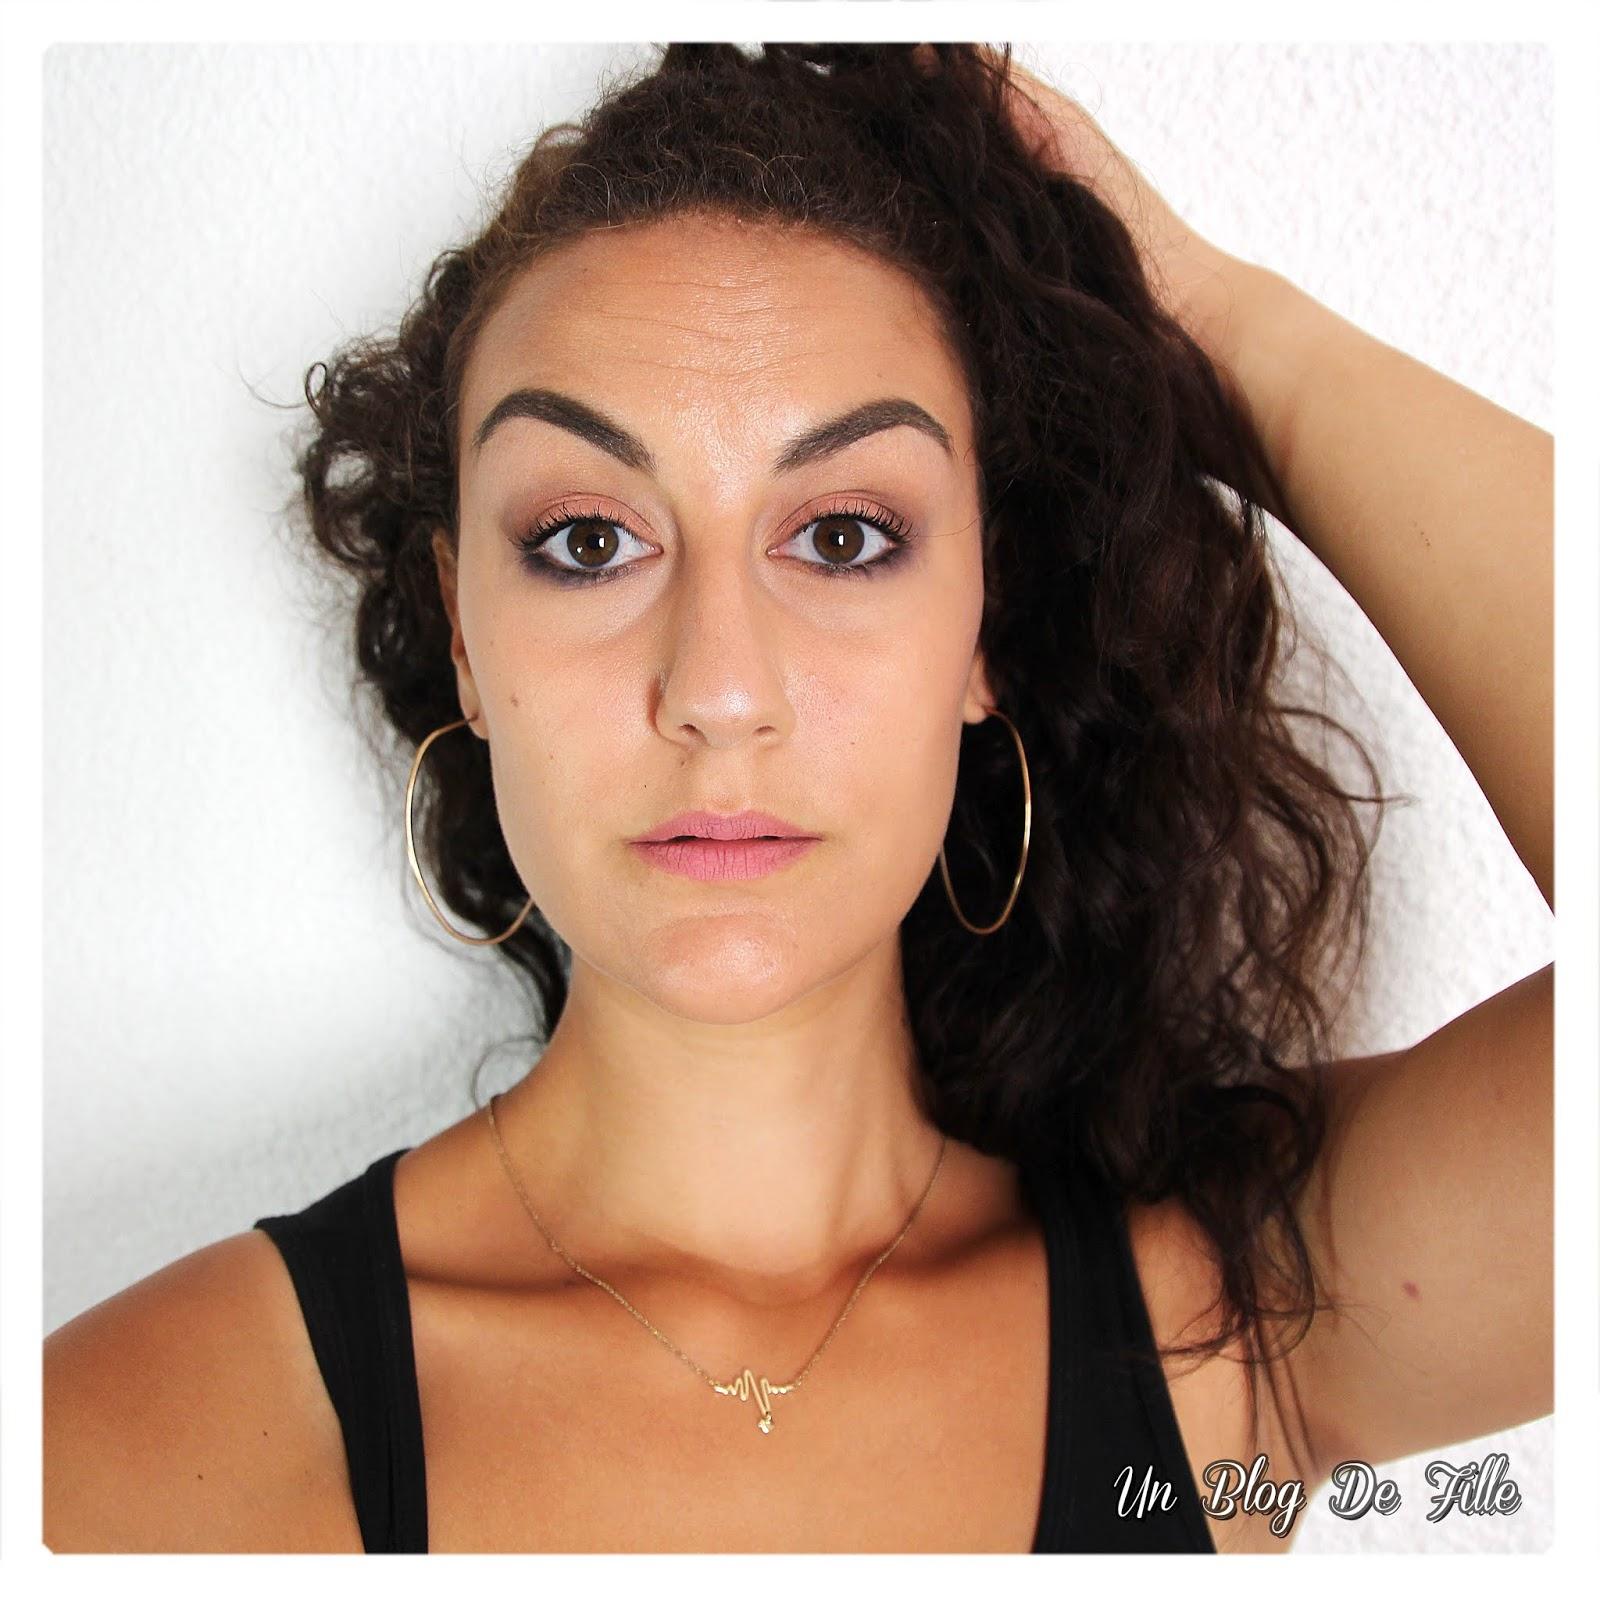 http://www.unblogdefille.fr/2018/09/maquillage-vieux-rose-et-indigo-msc.html